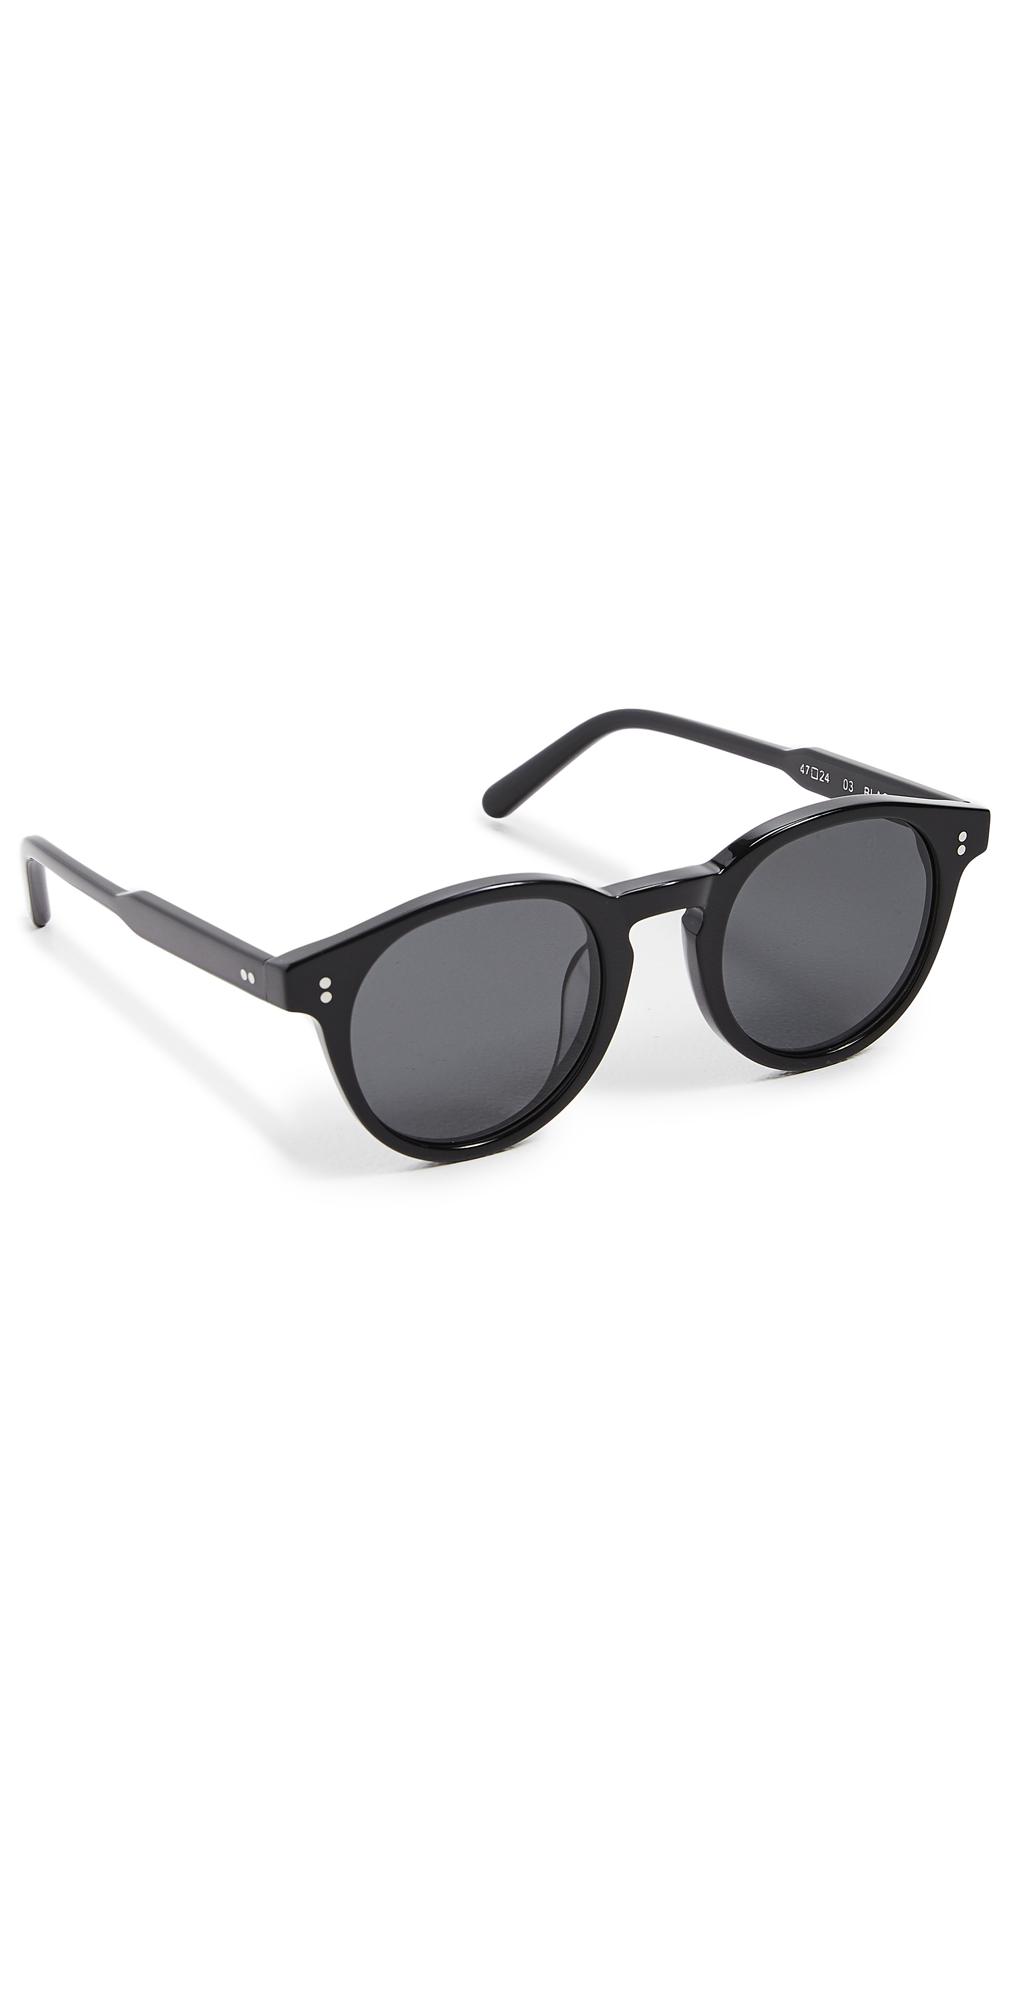 03 Sunglasses